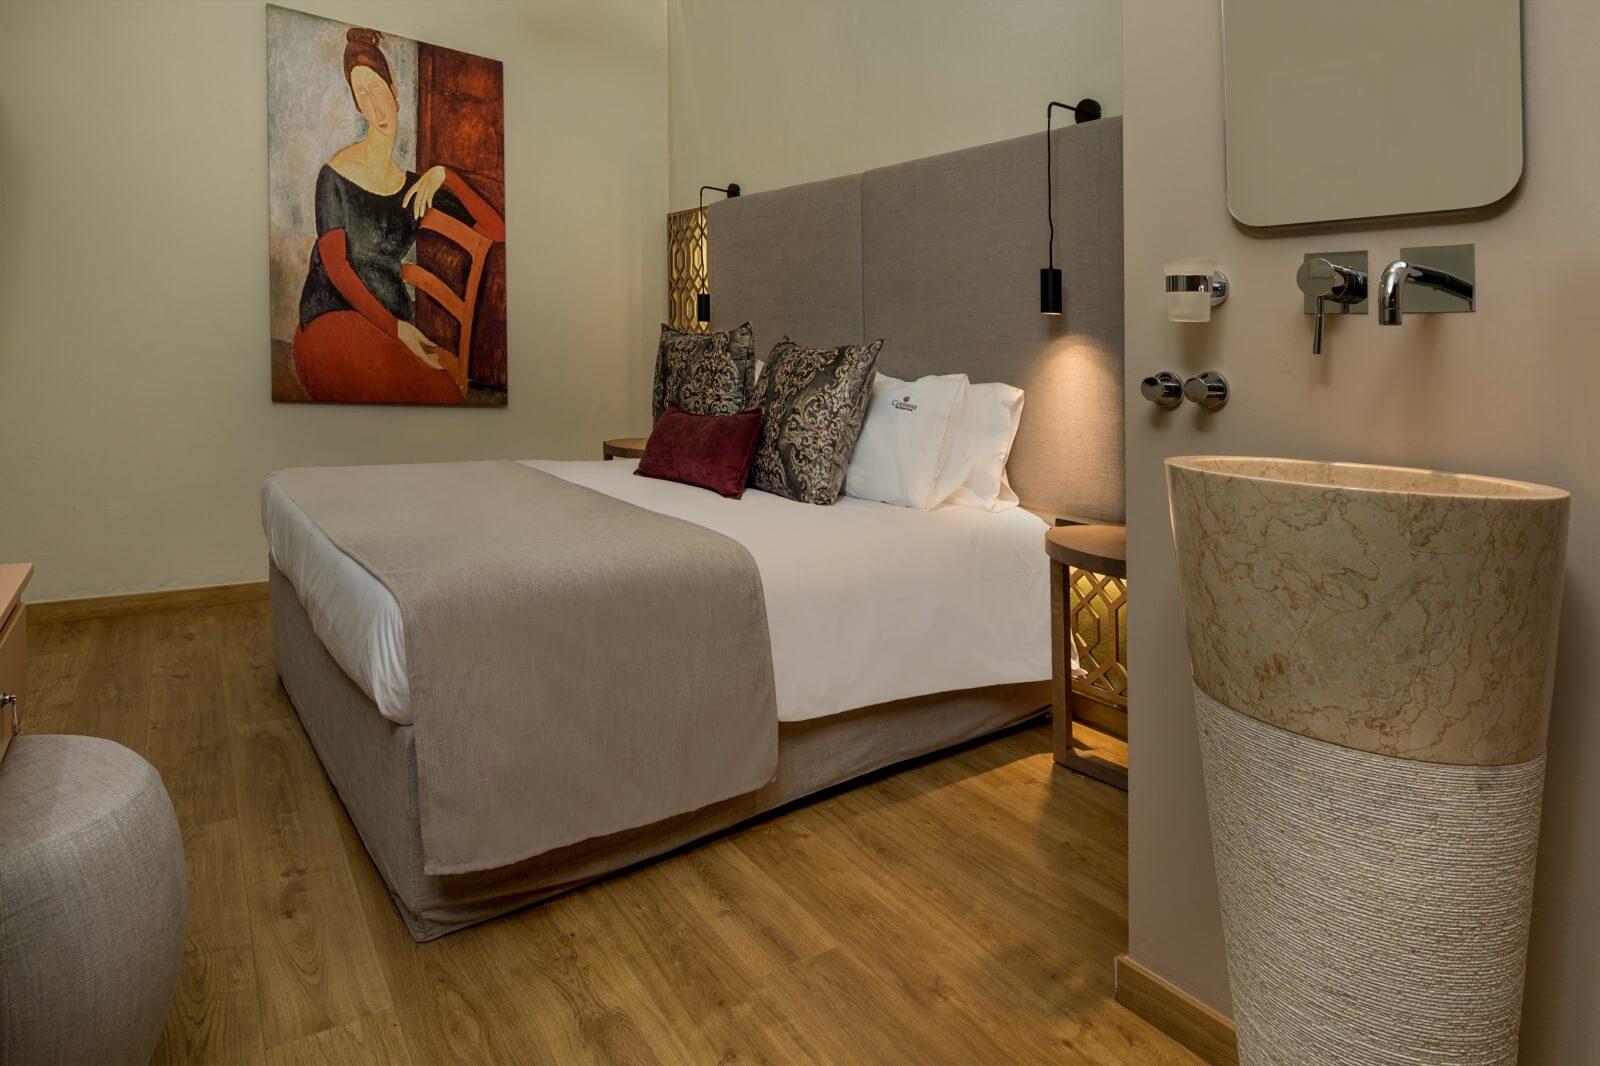 Contessa Boutique Hotel - Double Economy rooms